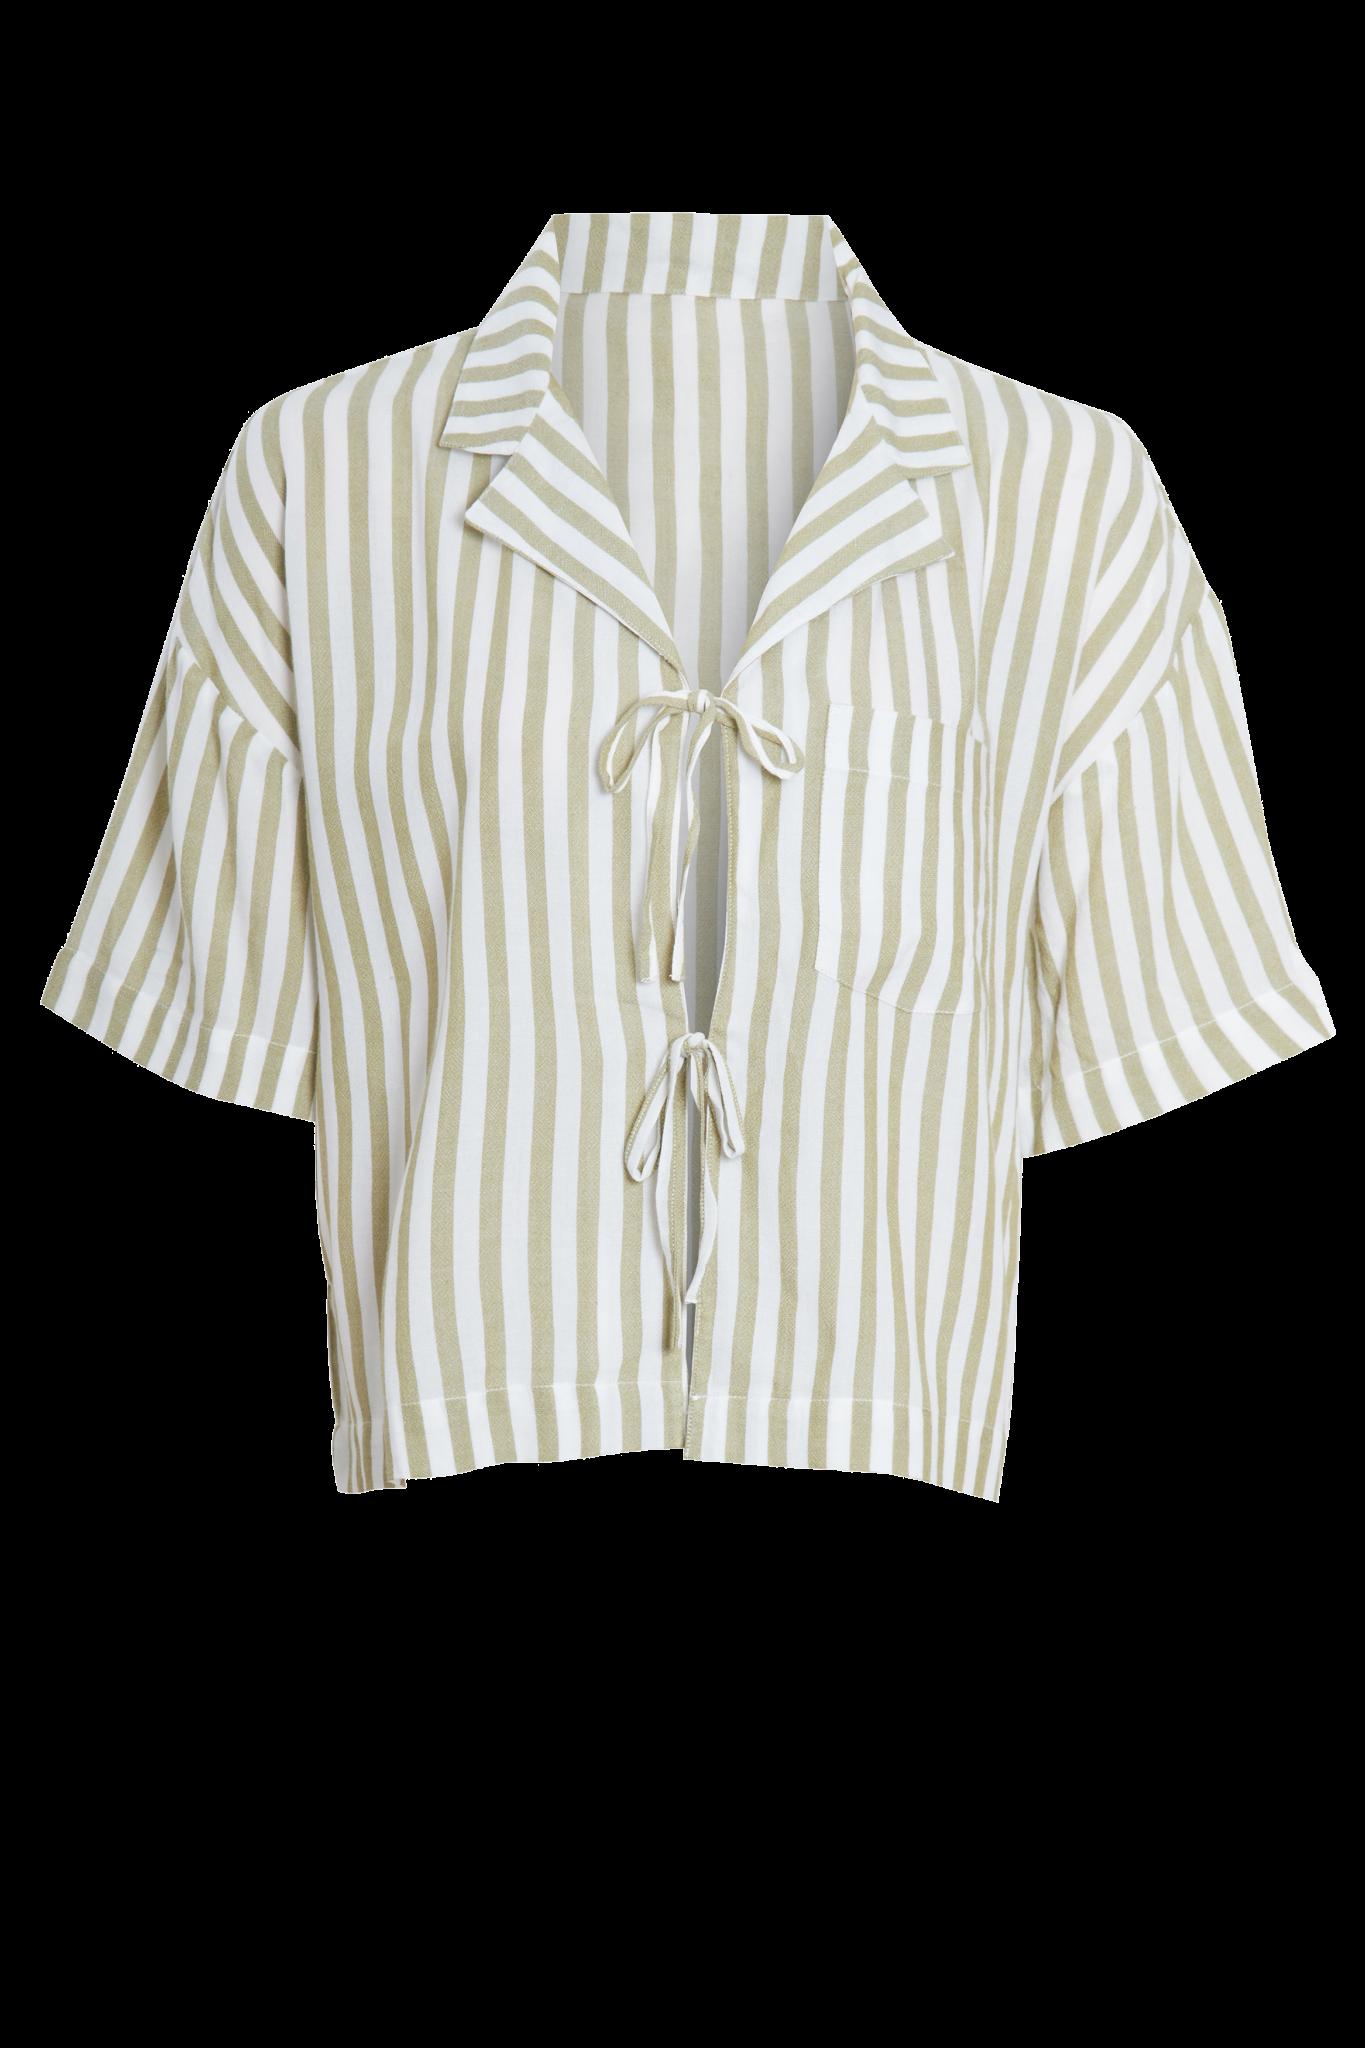 Native Youth Short Sleeve blouse